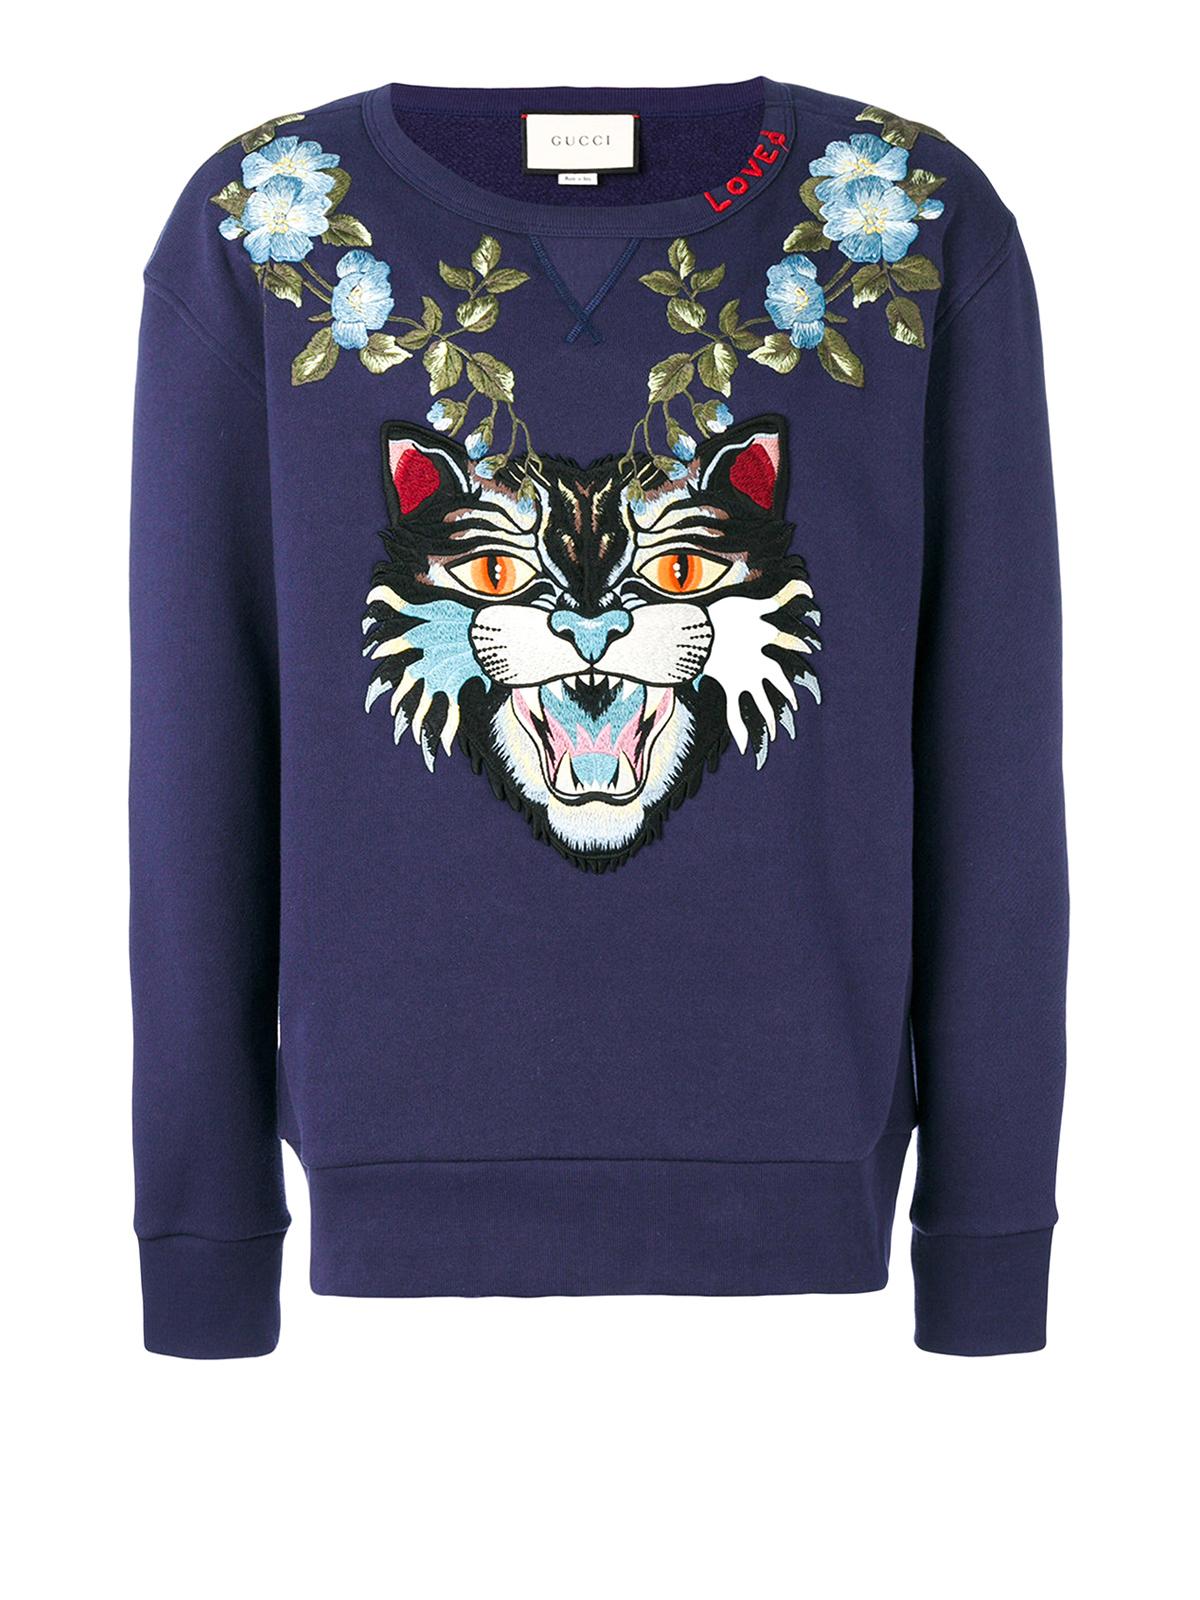 b457e809b598 Gucci - Angry Cat and floral sweatshirt - Sweatshirts & Sweaters ...